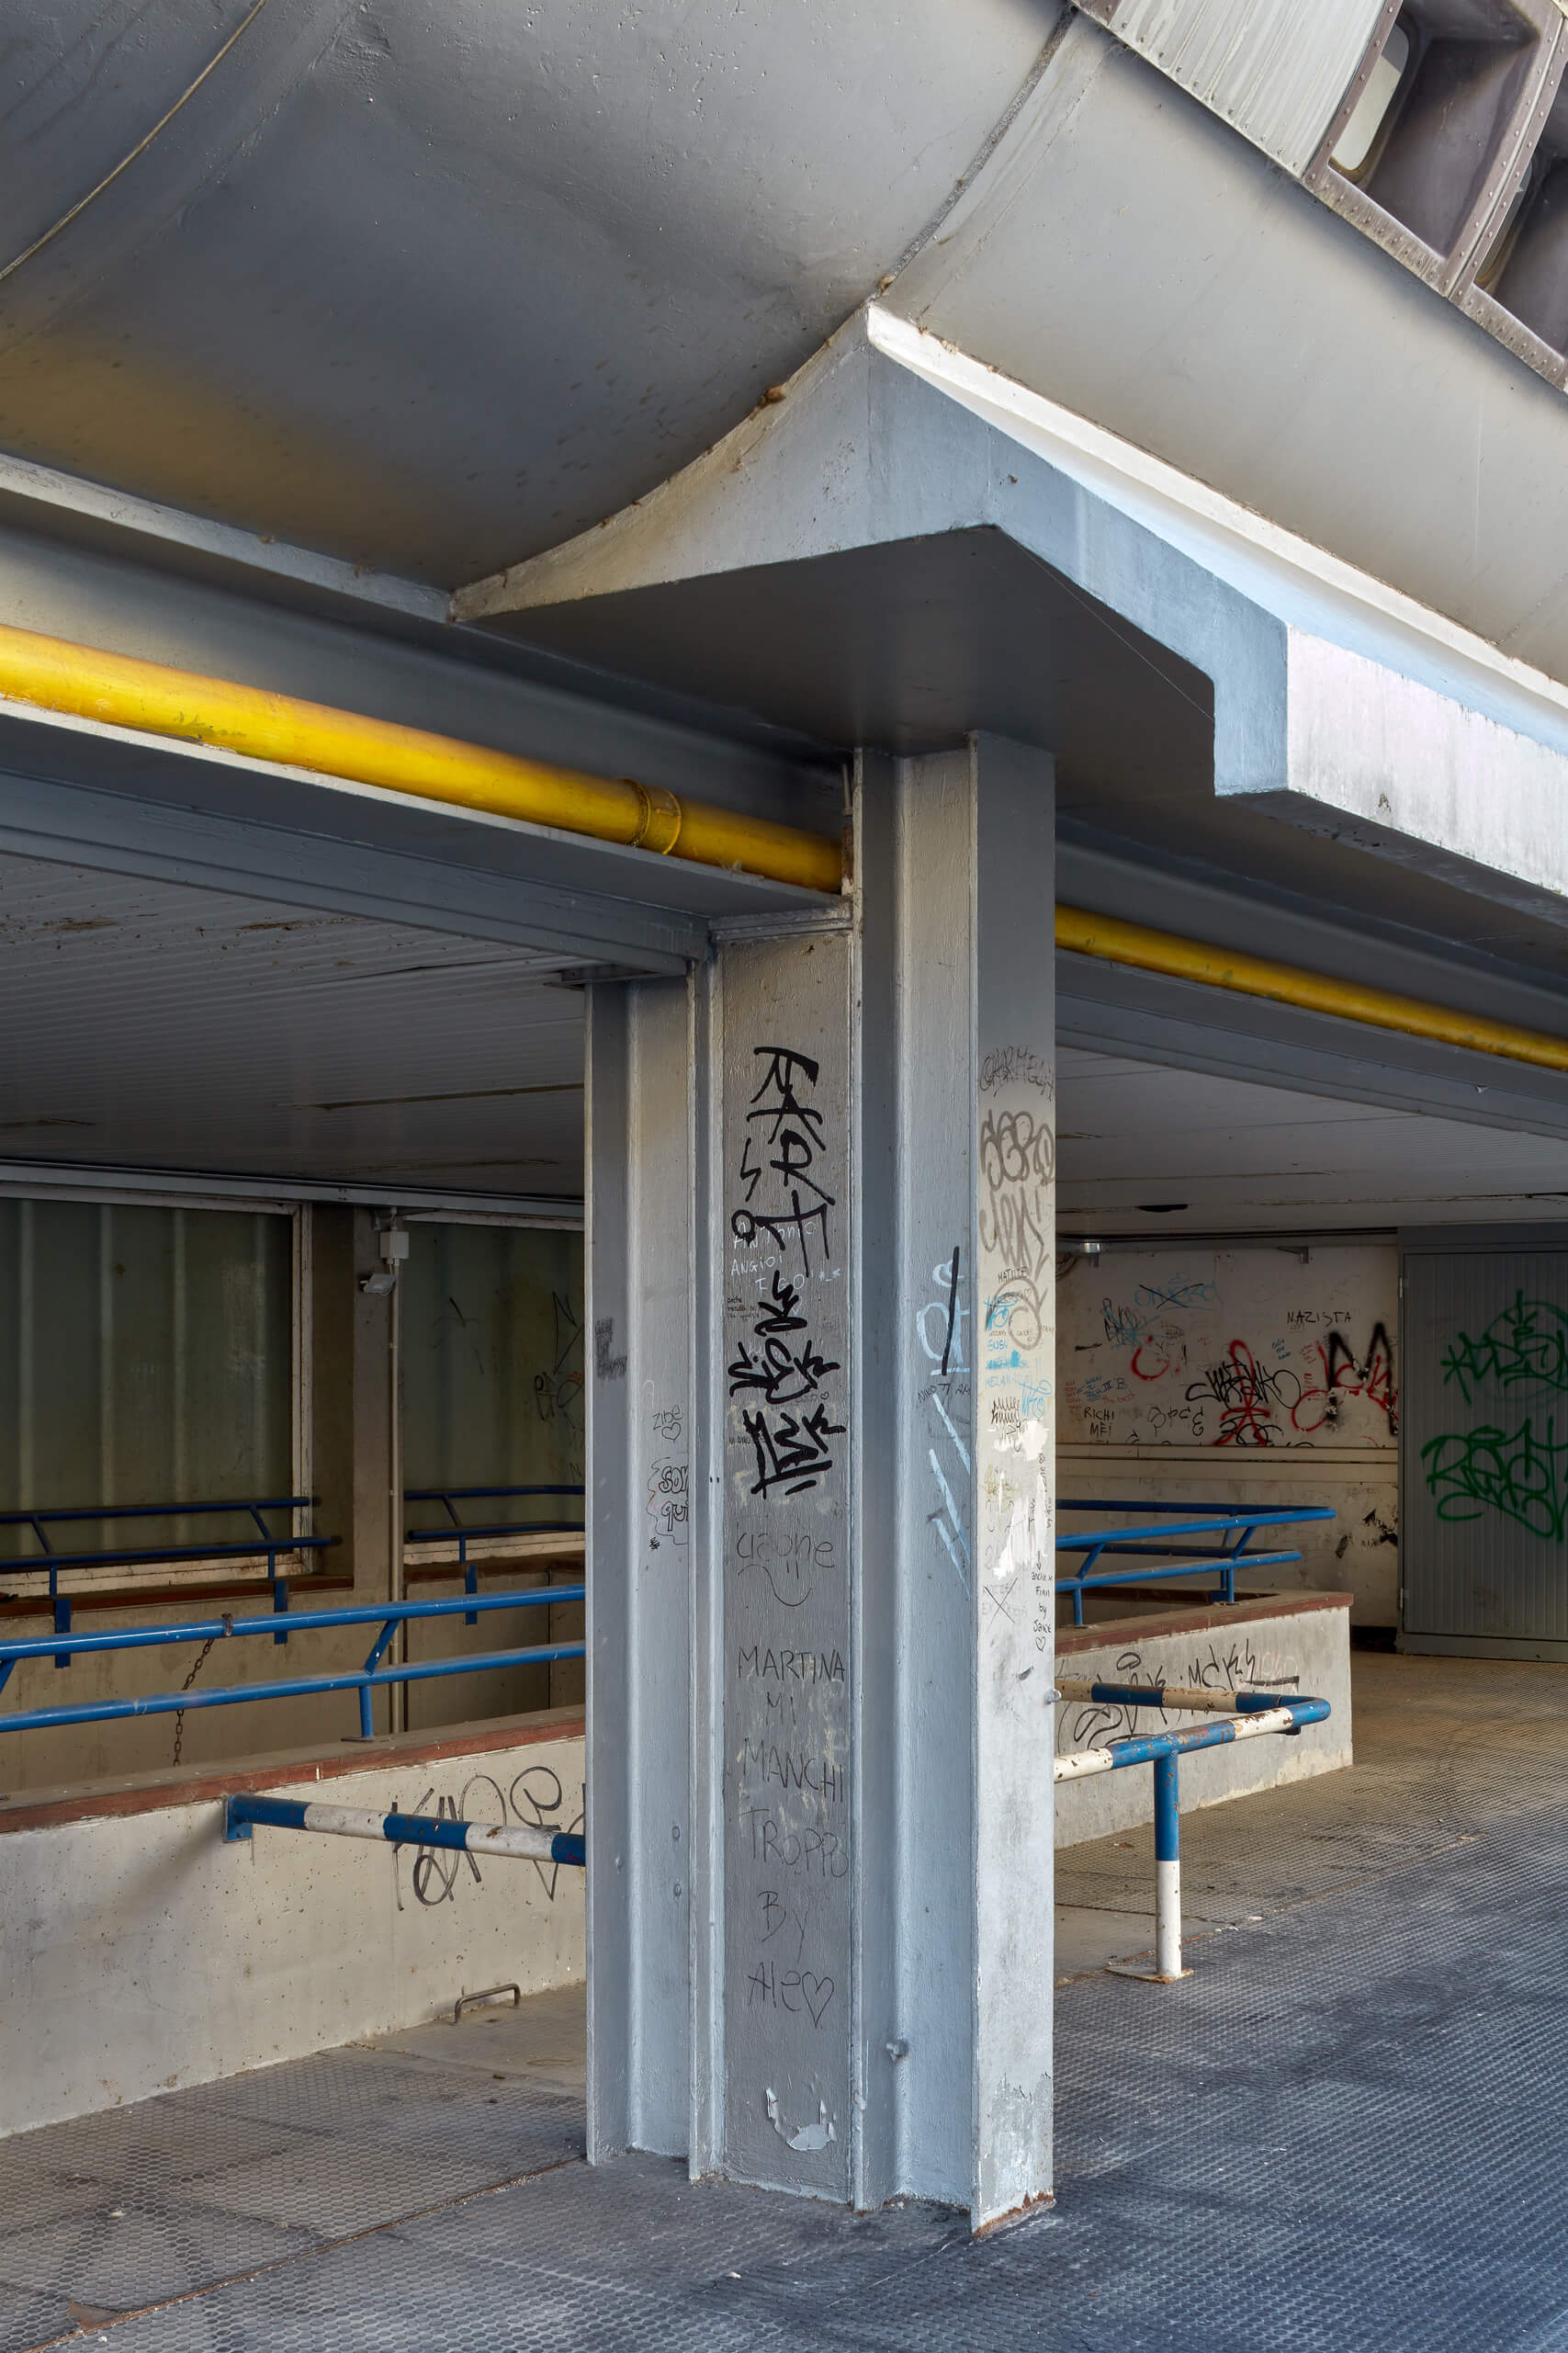 Federico_Covre_Cappai_Mainardis_Centro_Residenziale_Est_27_Ottobre_2019_55